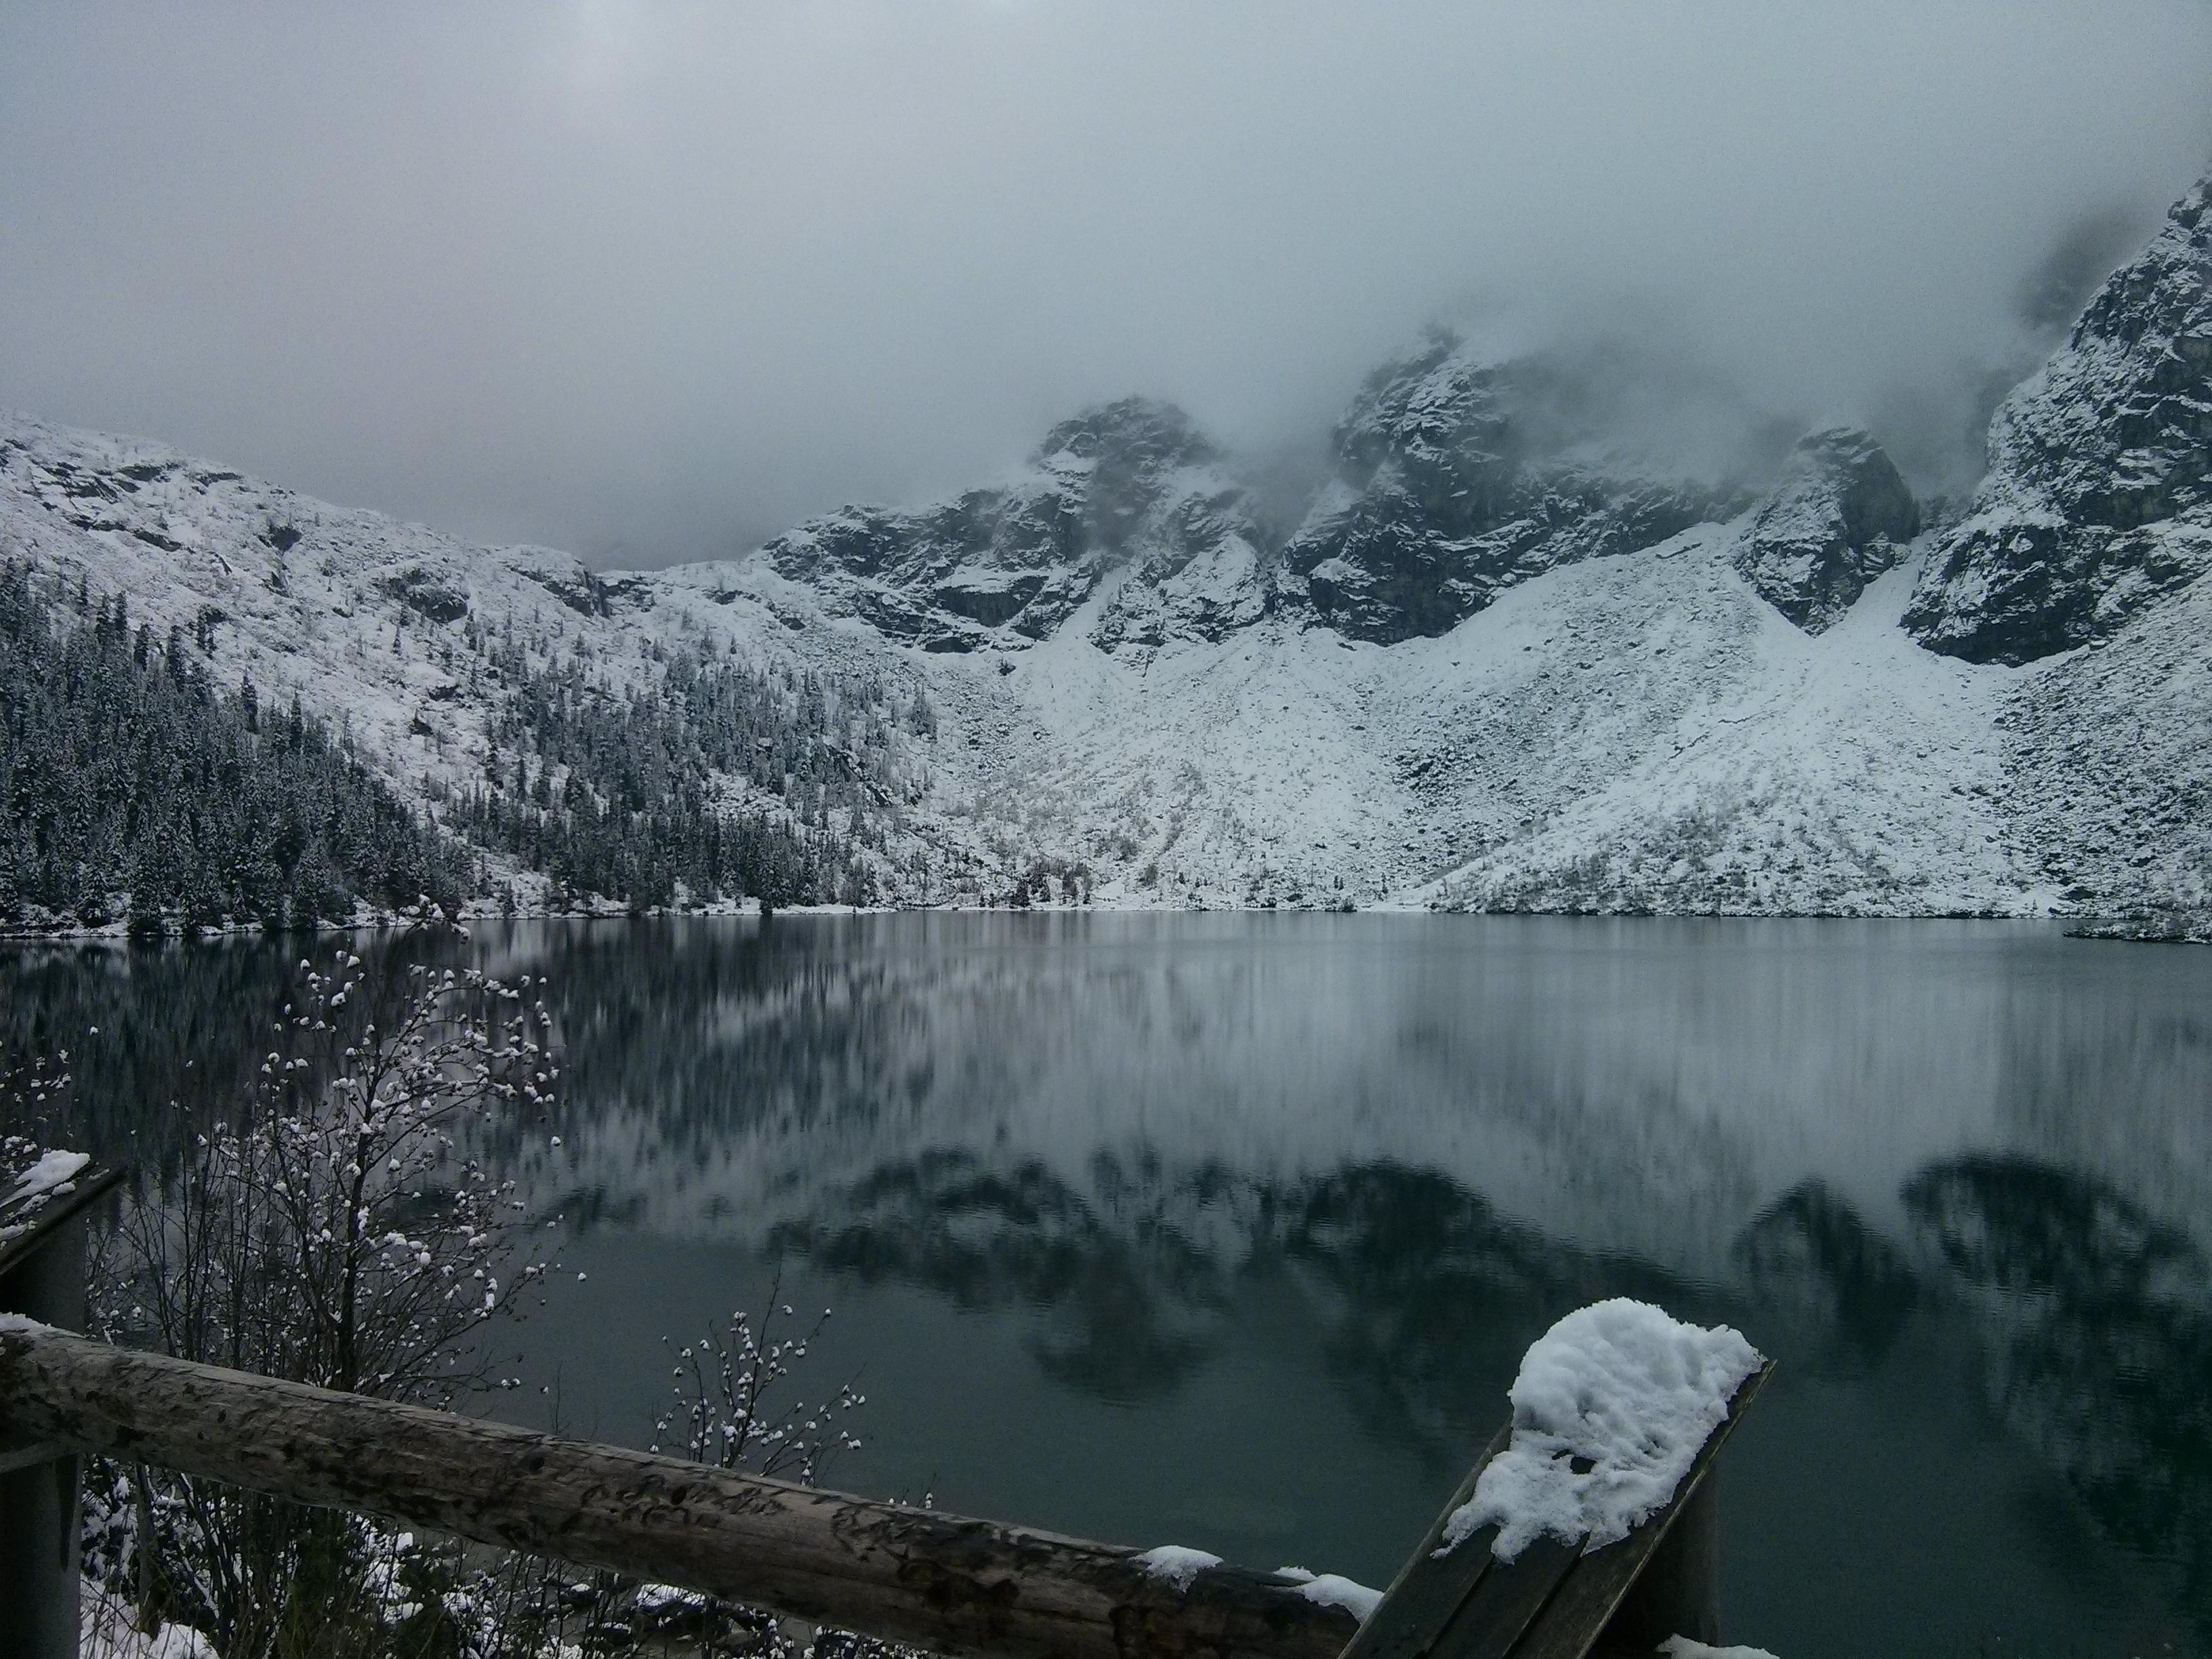 kostenlose foto landschaft wasser natur wildnis berg schnee nebel morgen see tal. Black Bedroom Furniture Sets. Home Design Ideas